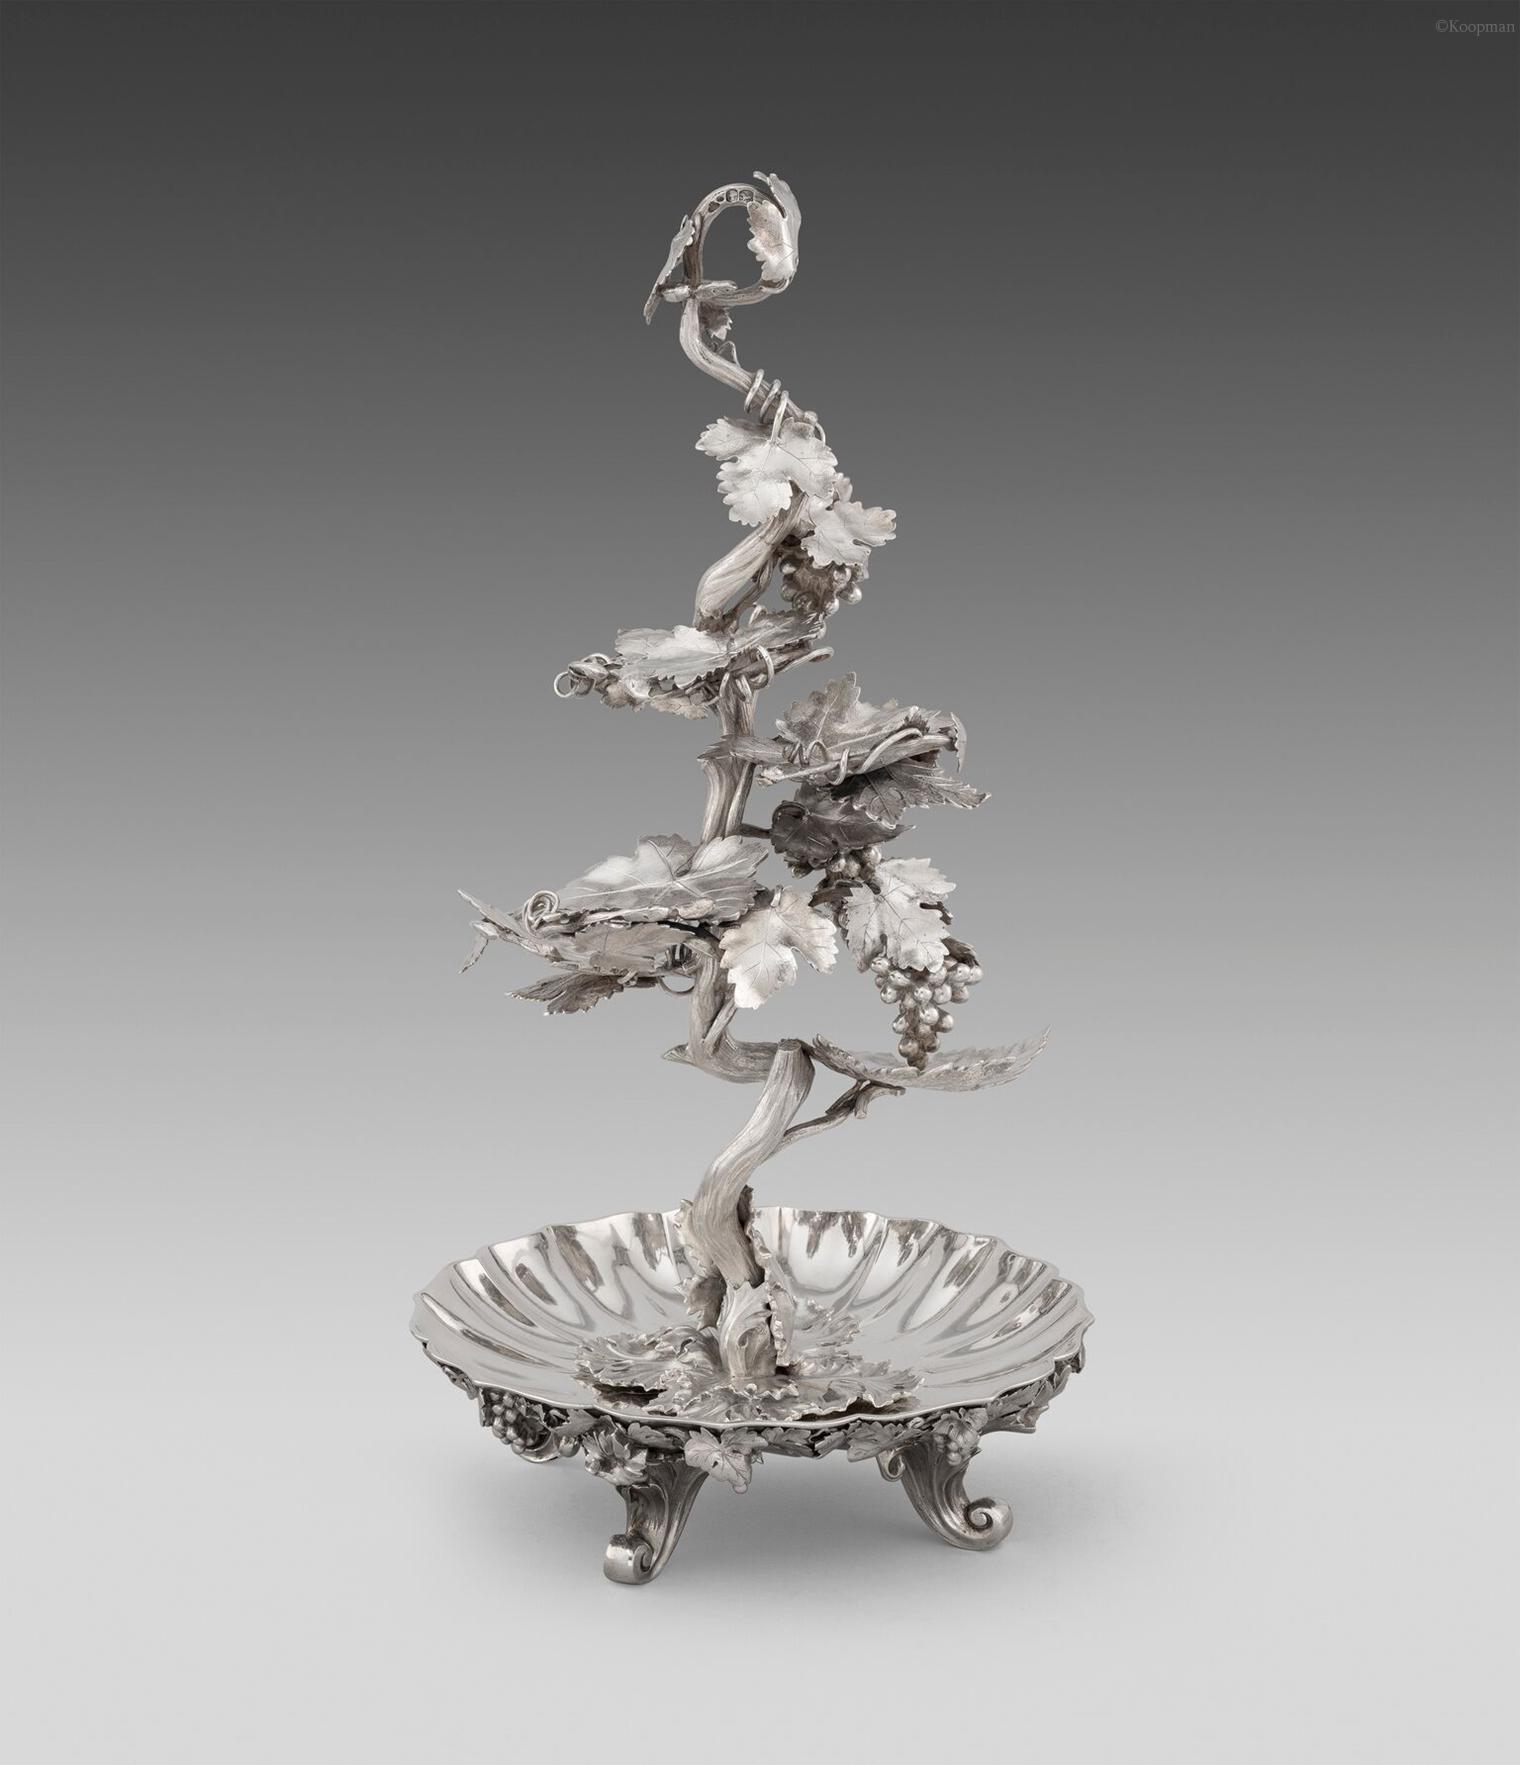 A Rare Victorian Dessert Centrepiece Silver